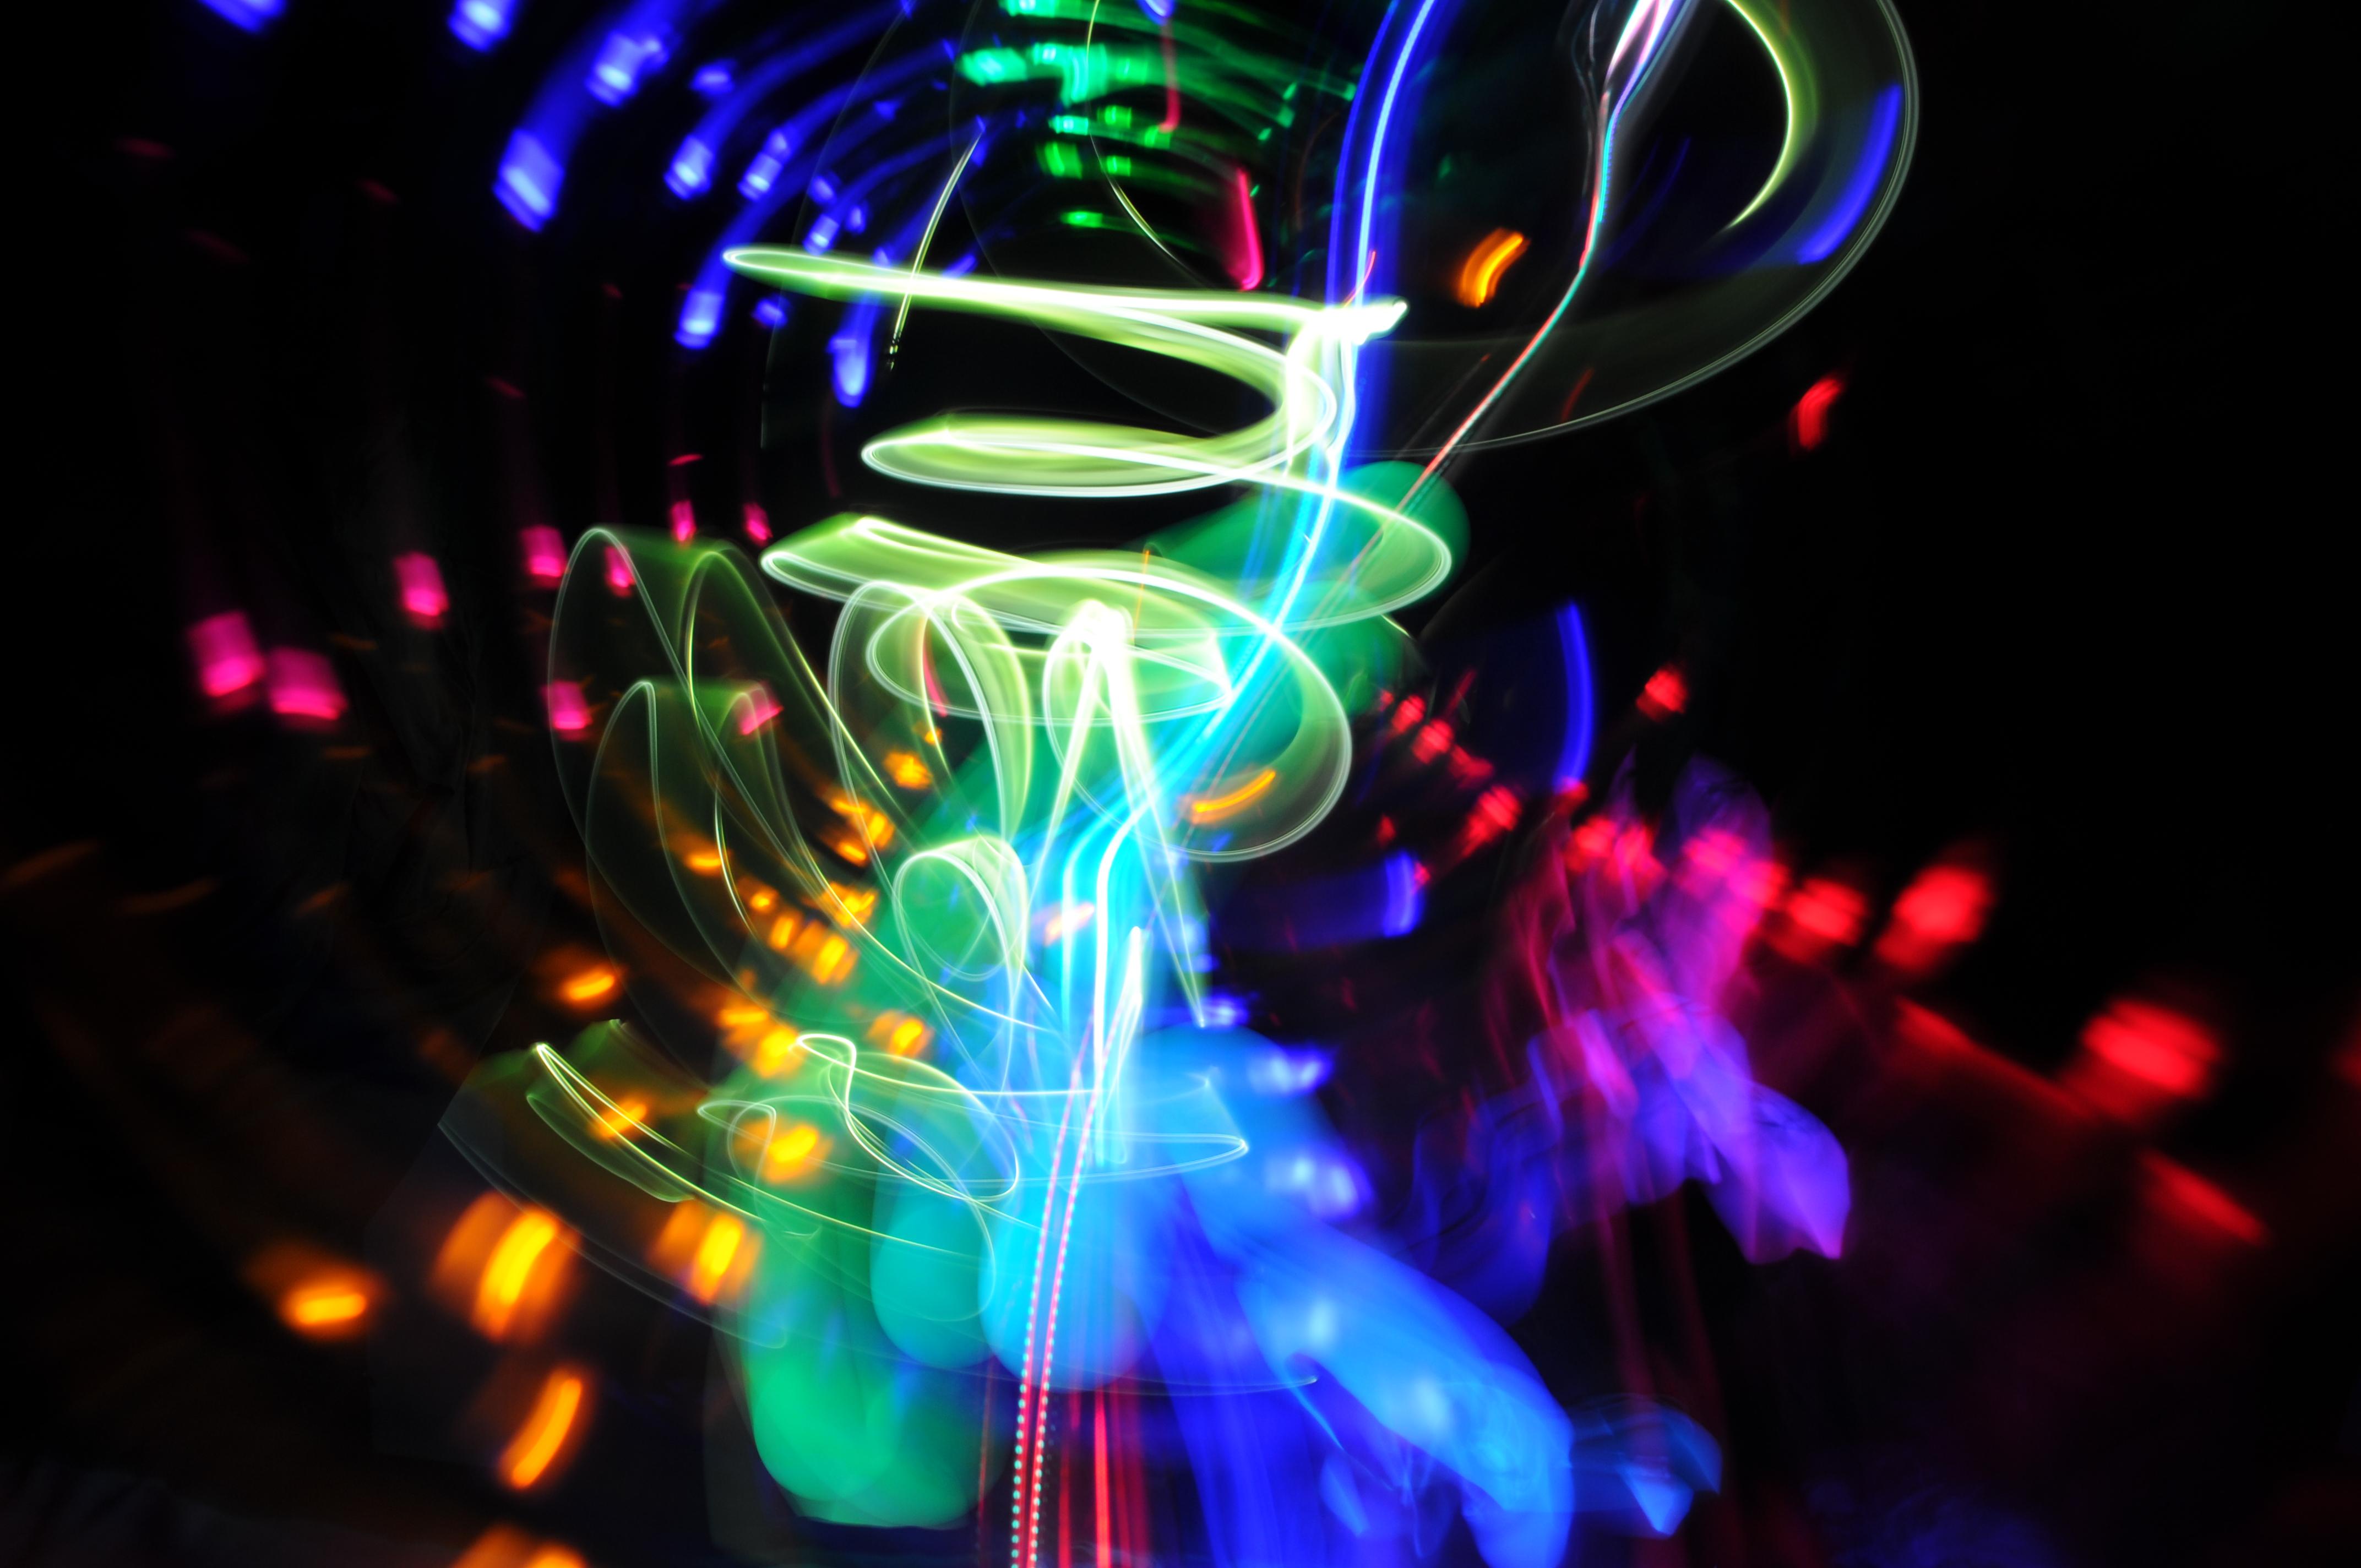 abstract light painting by nightbearfoto on DeviantArt